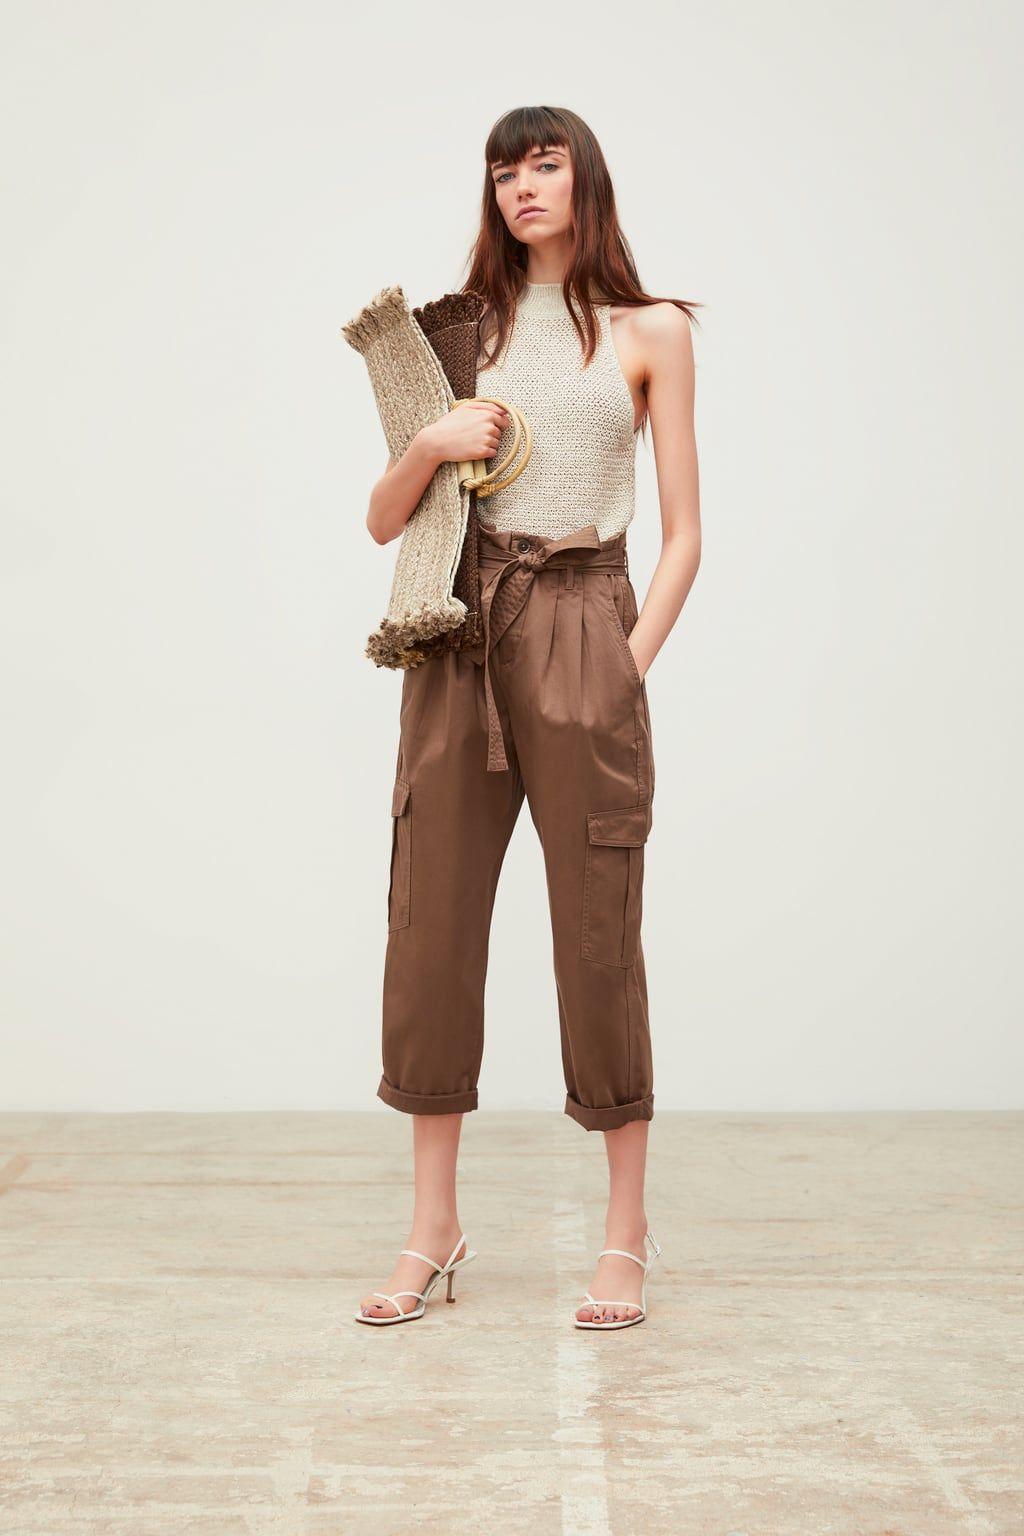 Pantaloni Italia Collezione Zara Outfits DonnaNuova Da Online N8n0mw